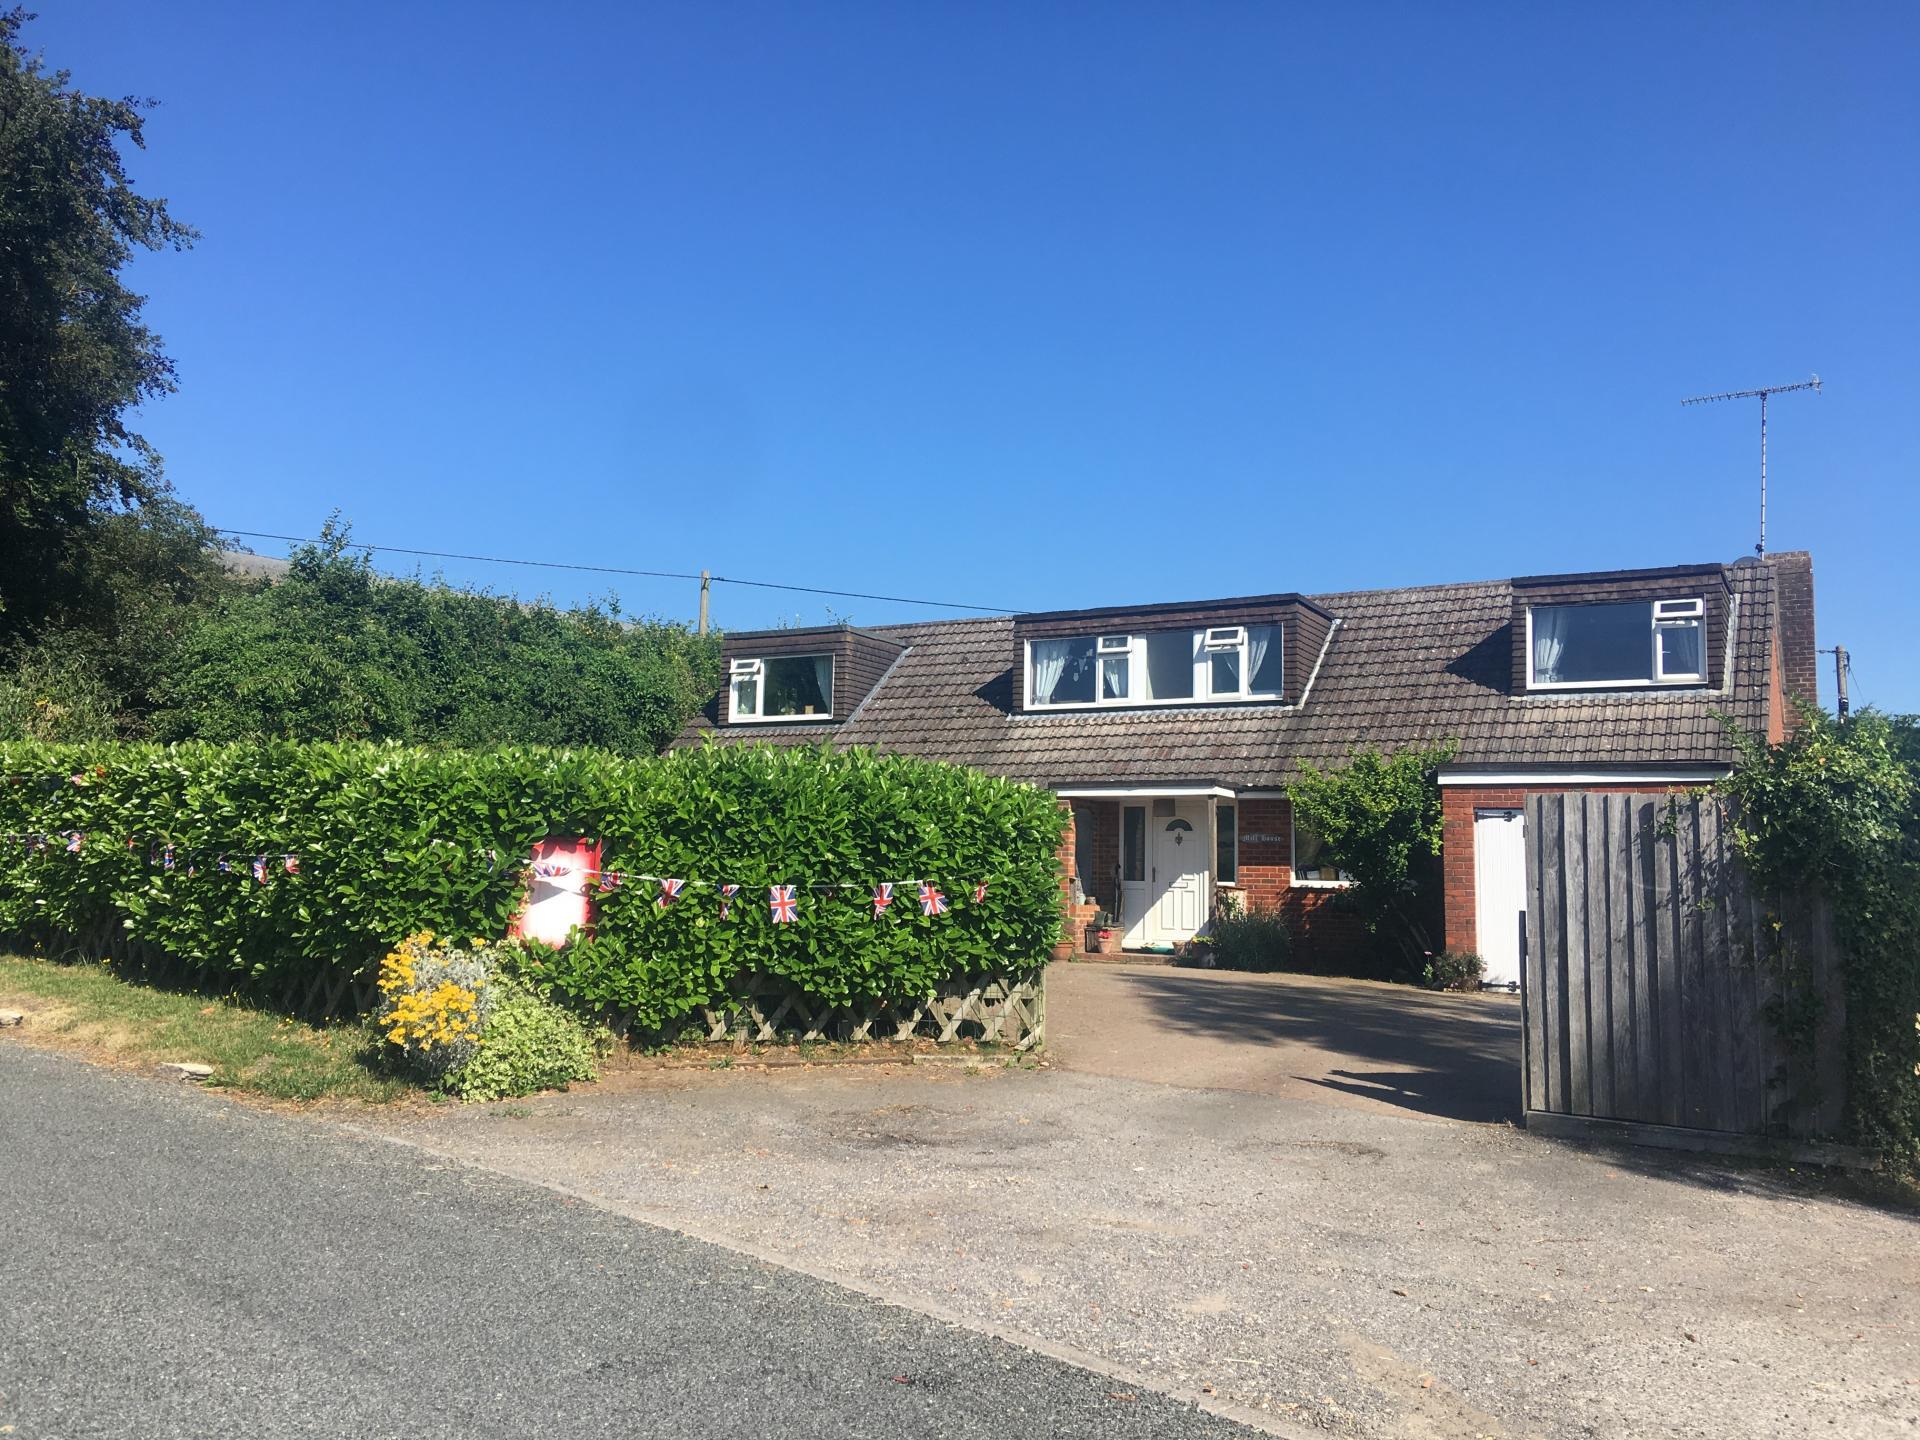 5 Bedrooms Detached House for sale in West Dean, Salisbury